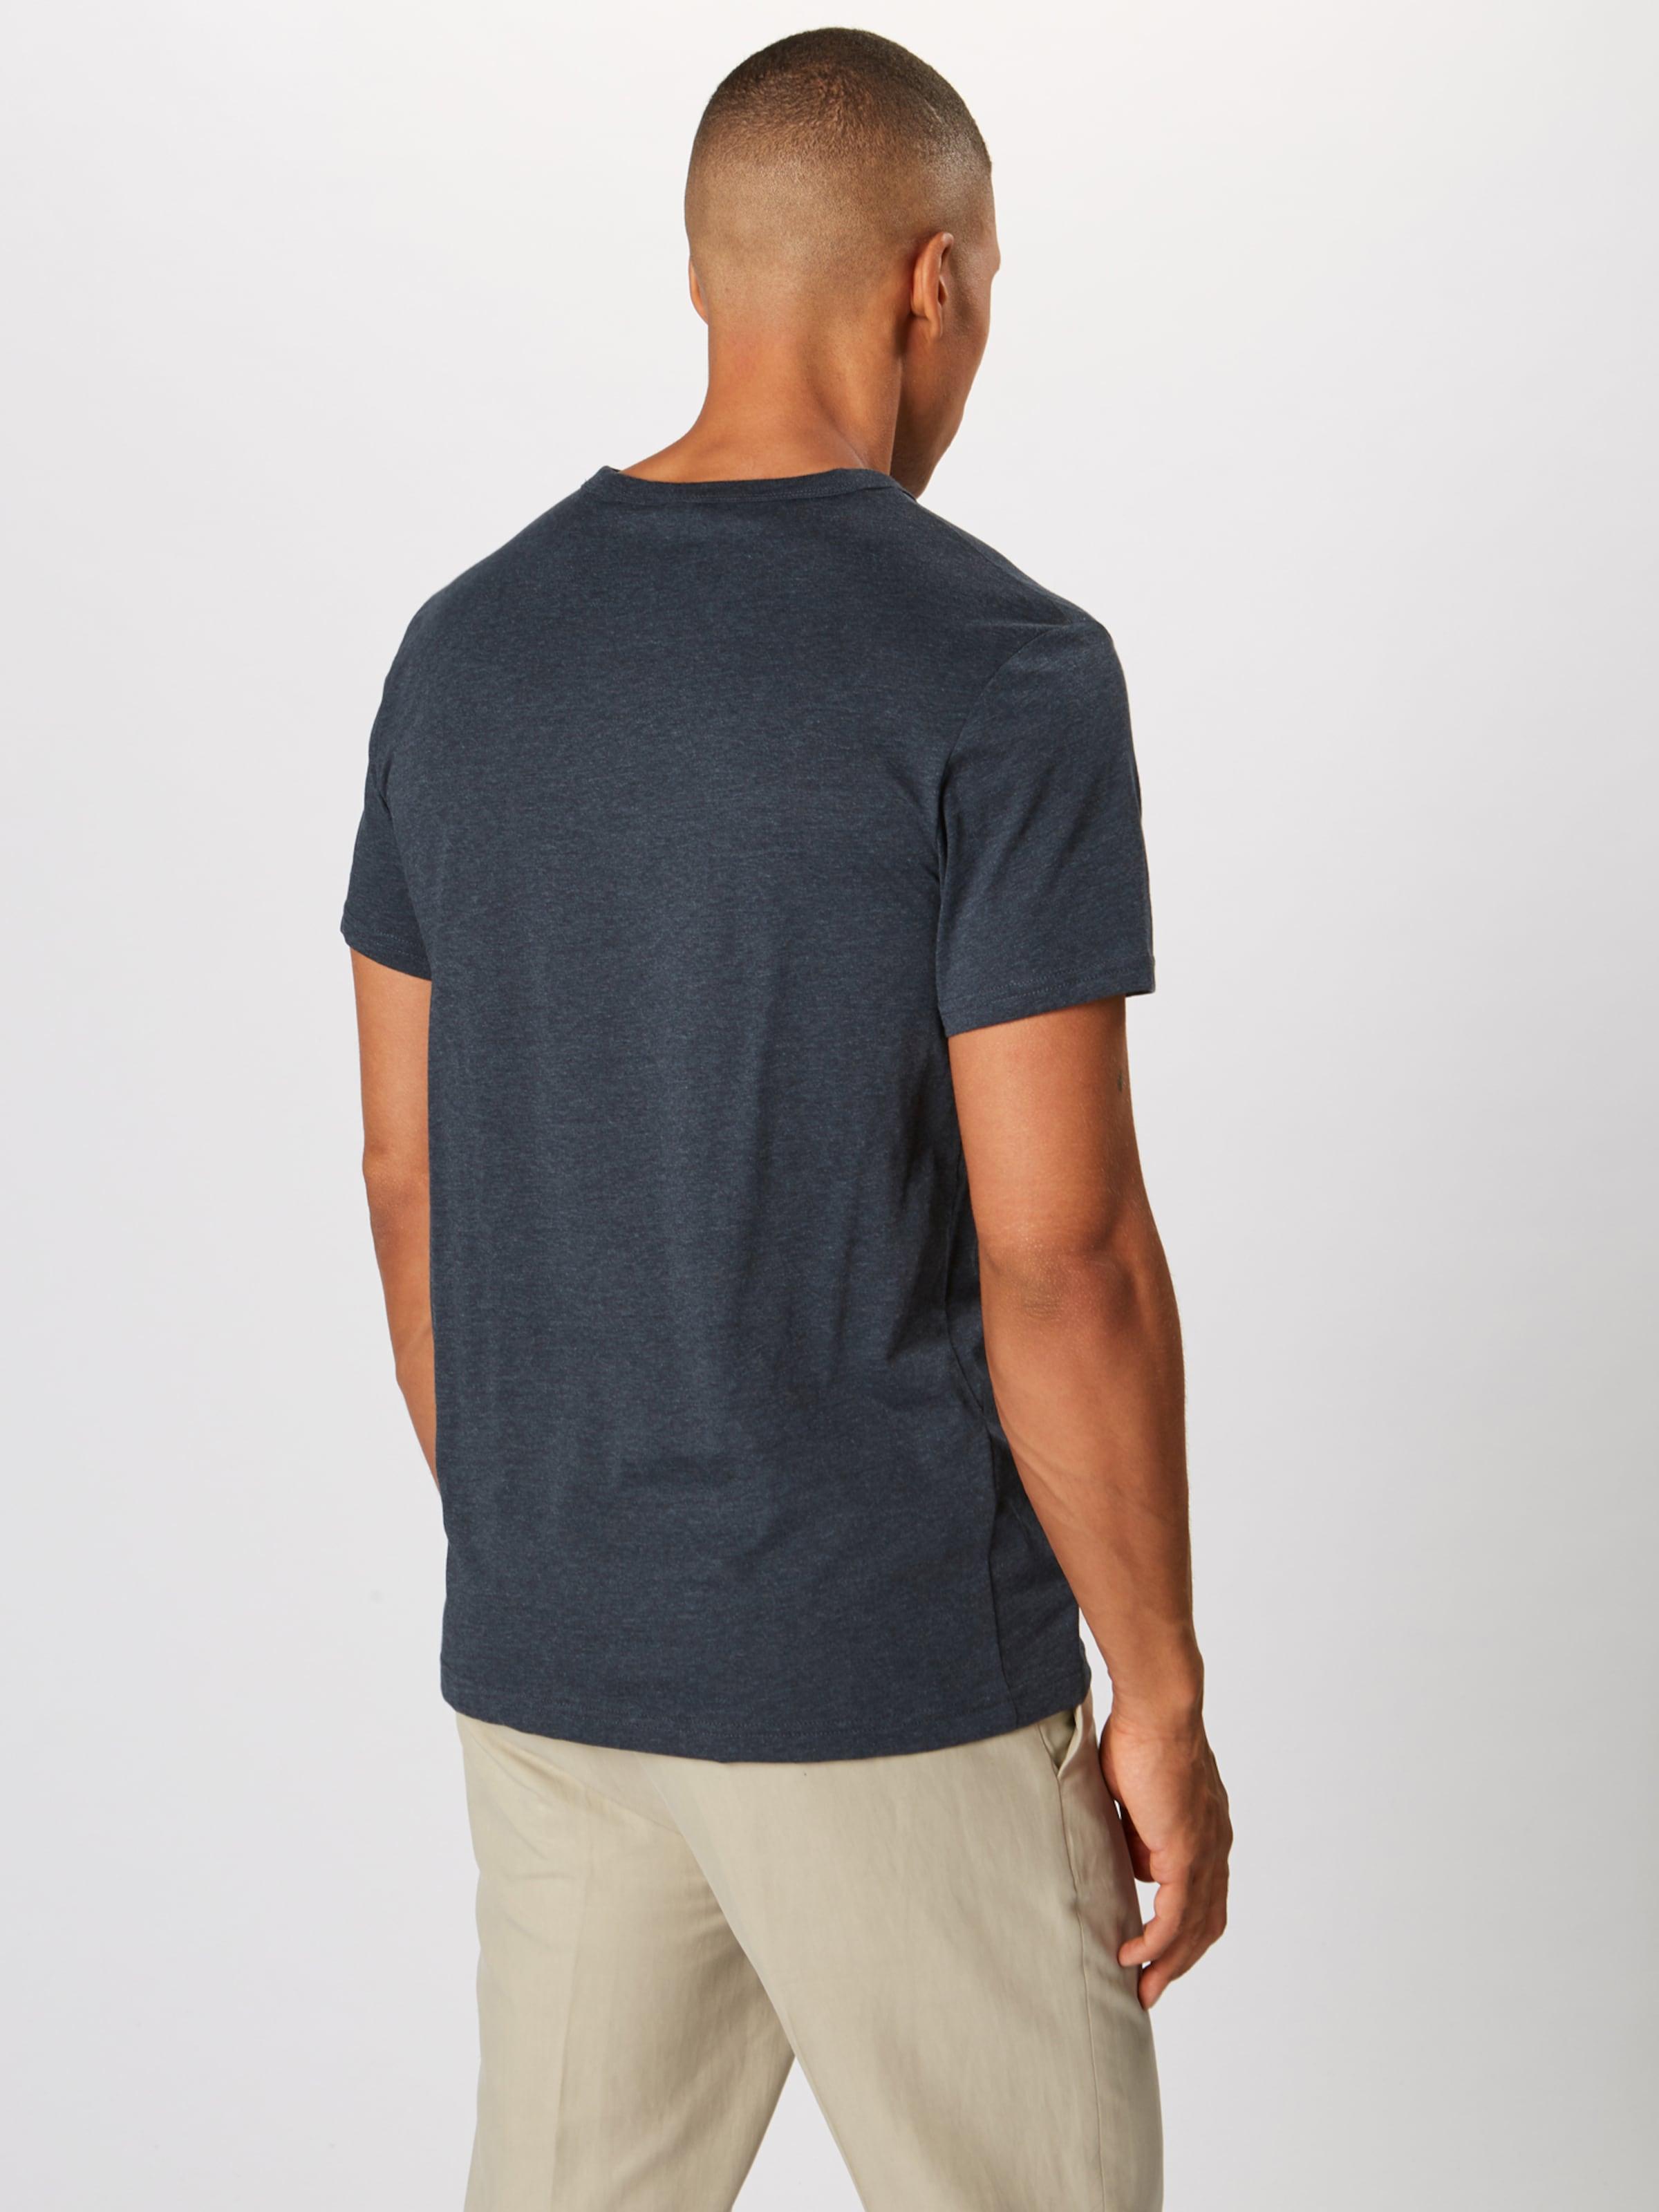 G In star T shirt Dunkelblau R 'rodis New York' Raw T n0PZk8NOwX